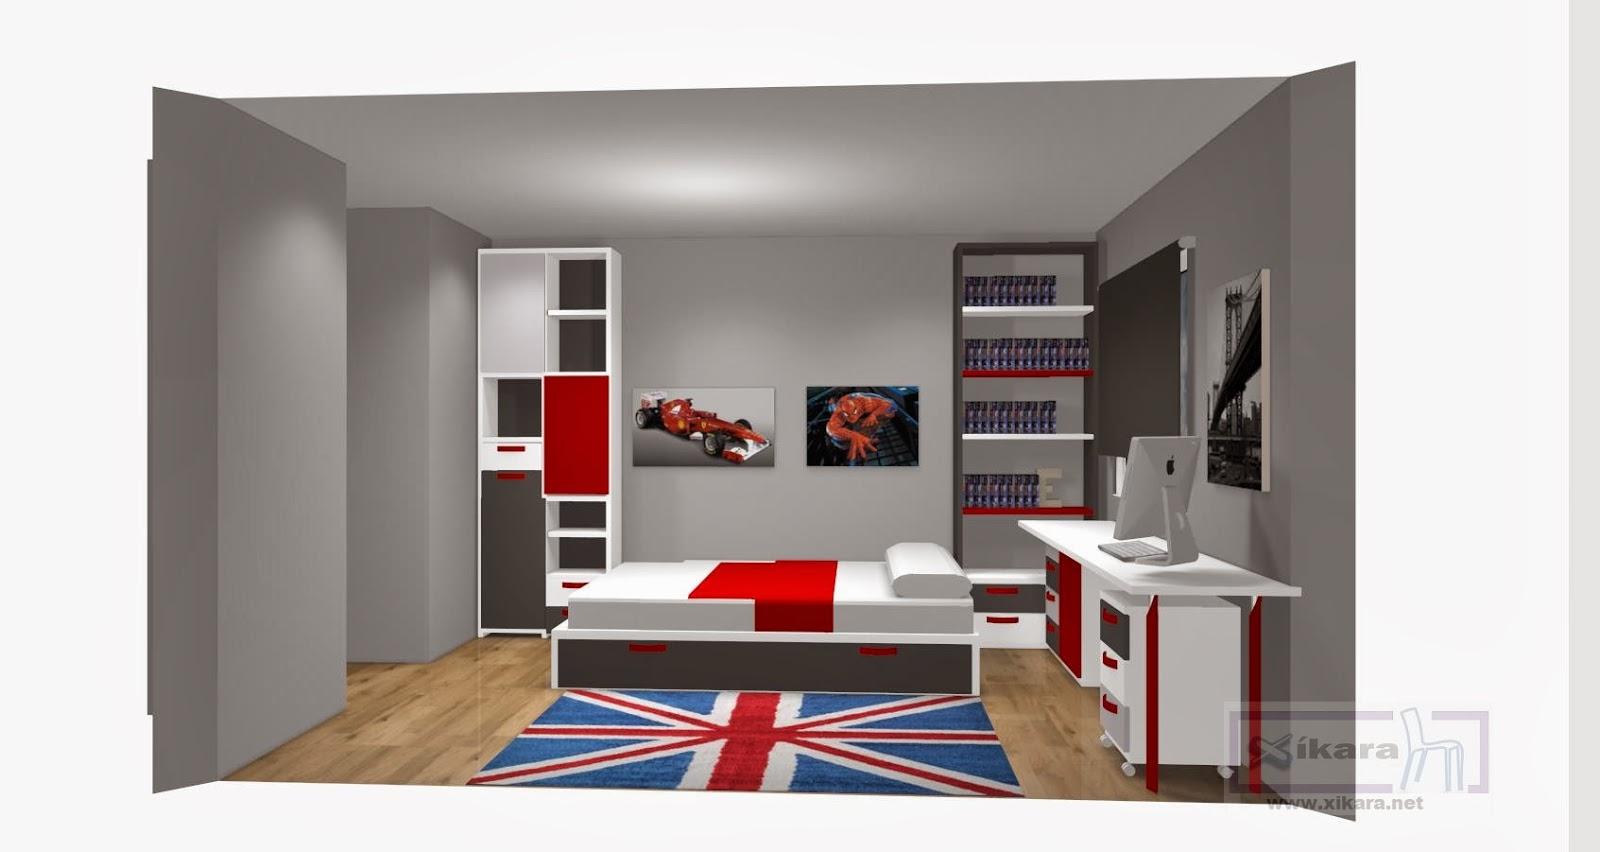 Dormitorios juveniles grises - Habitaciones juveniles originales ...